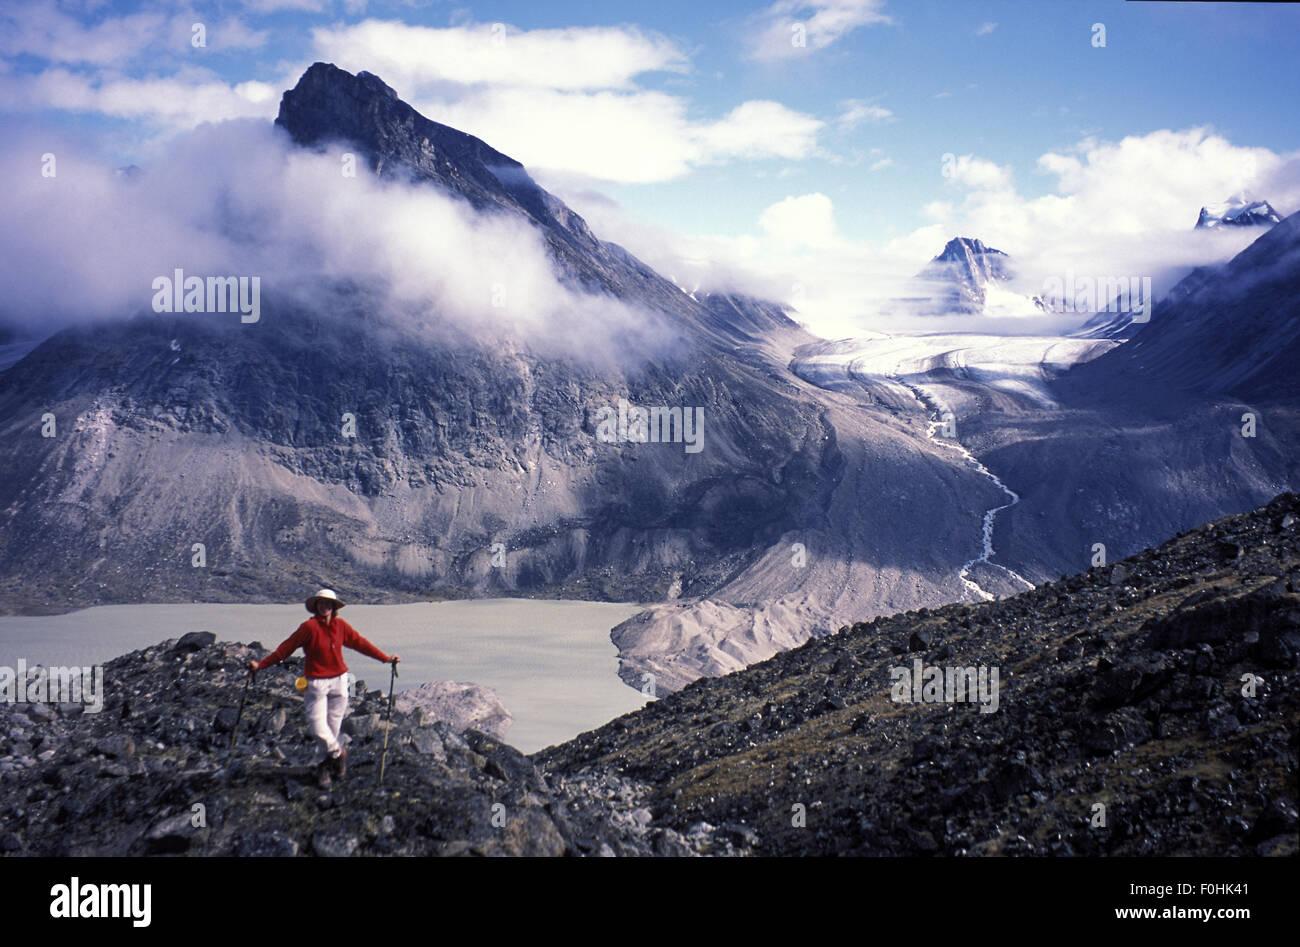 Backpacking on Baffin Island - Stock Image